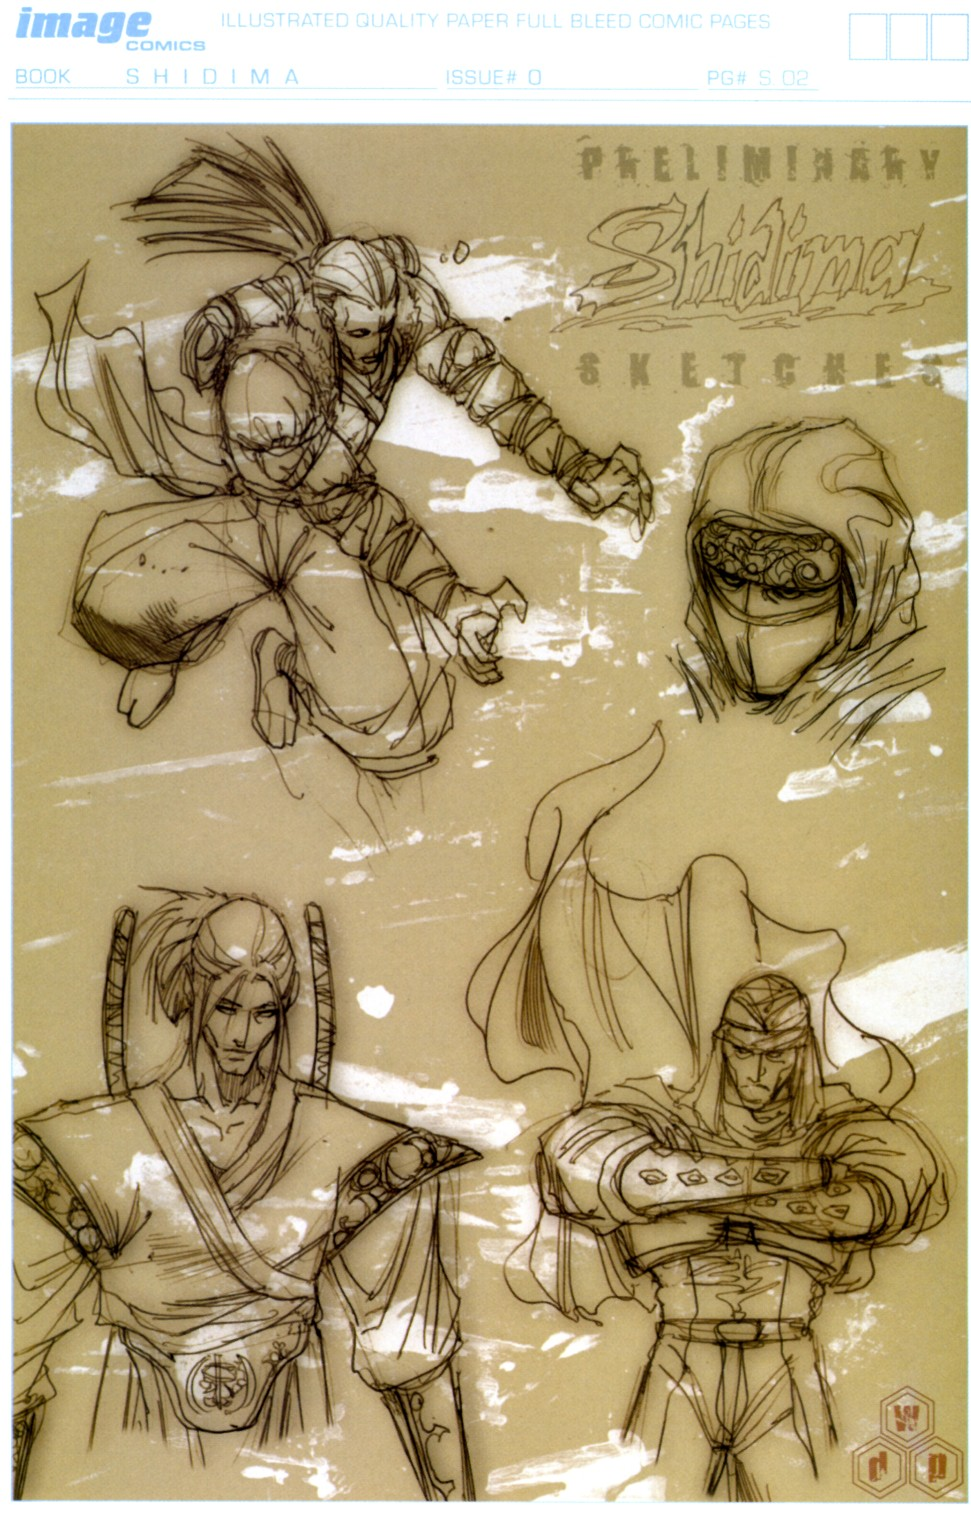 Read online Shidima comic -  Issue #0 - 15